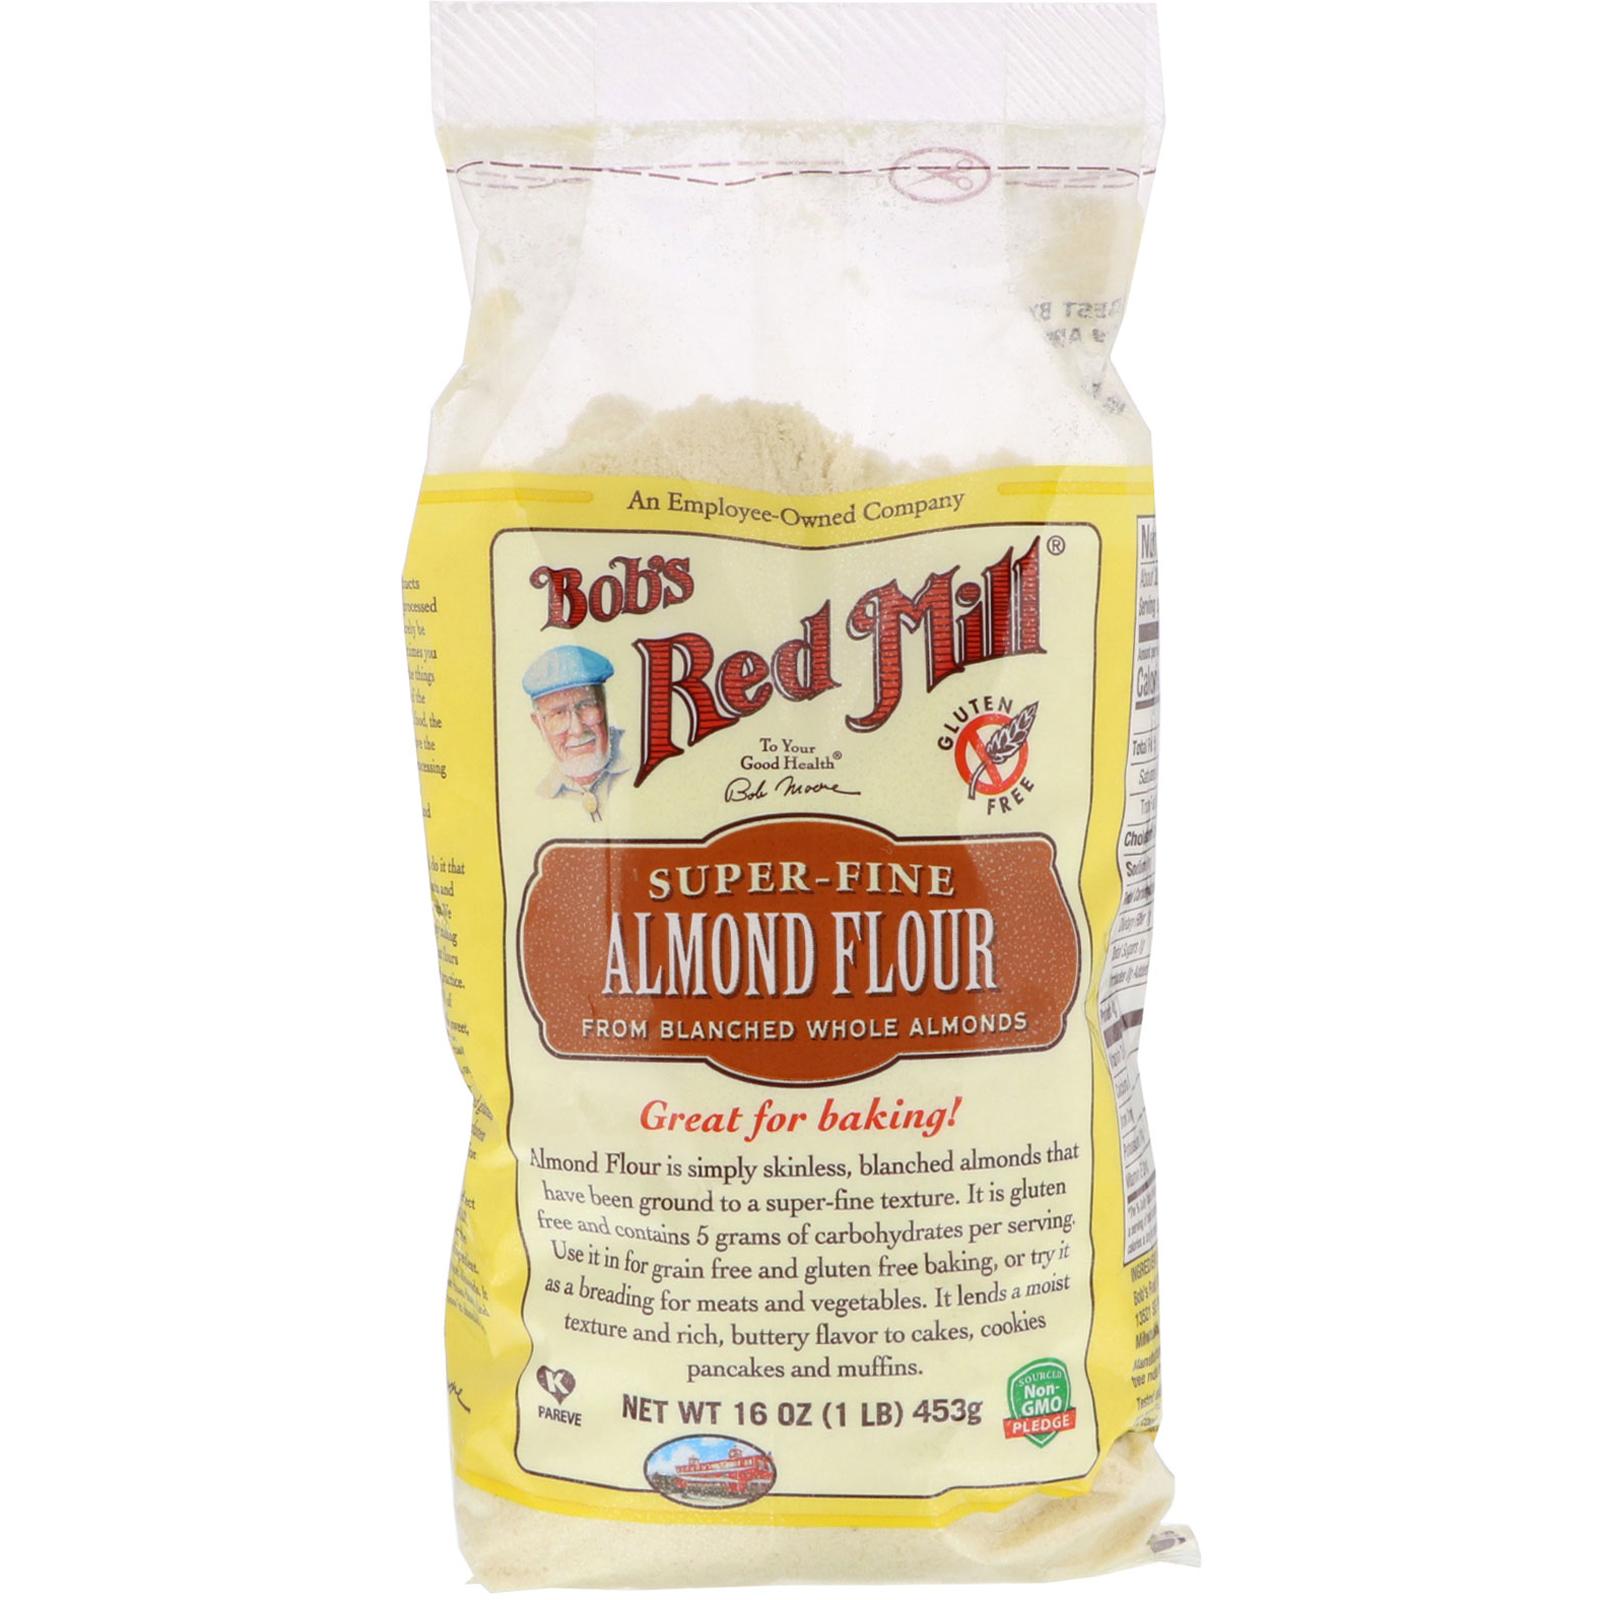 Bob's Red Mill, Super-Fine Almond Flour, Gluten-Free, 16 oz